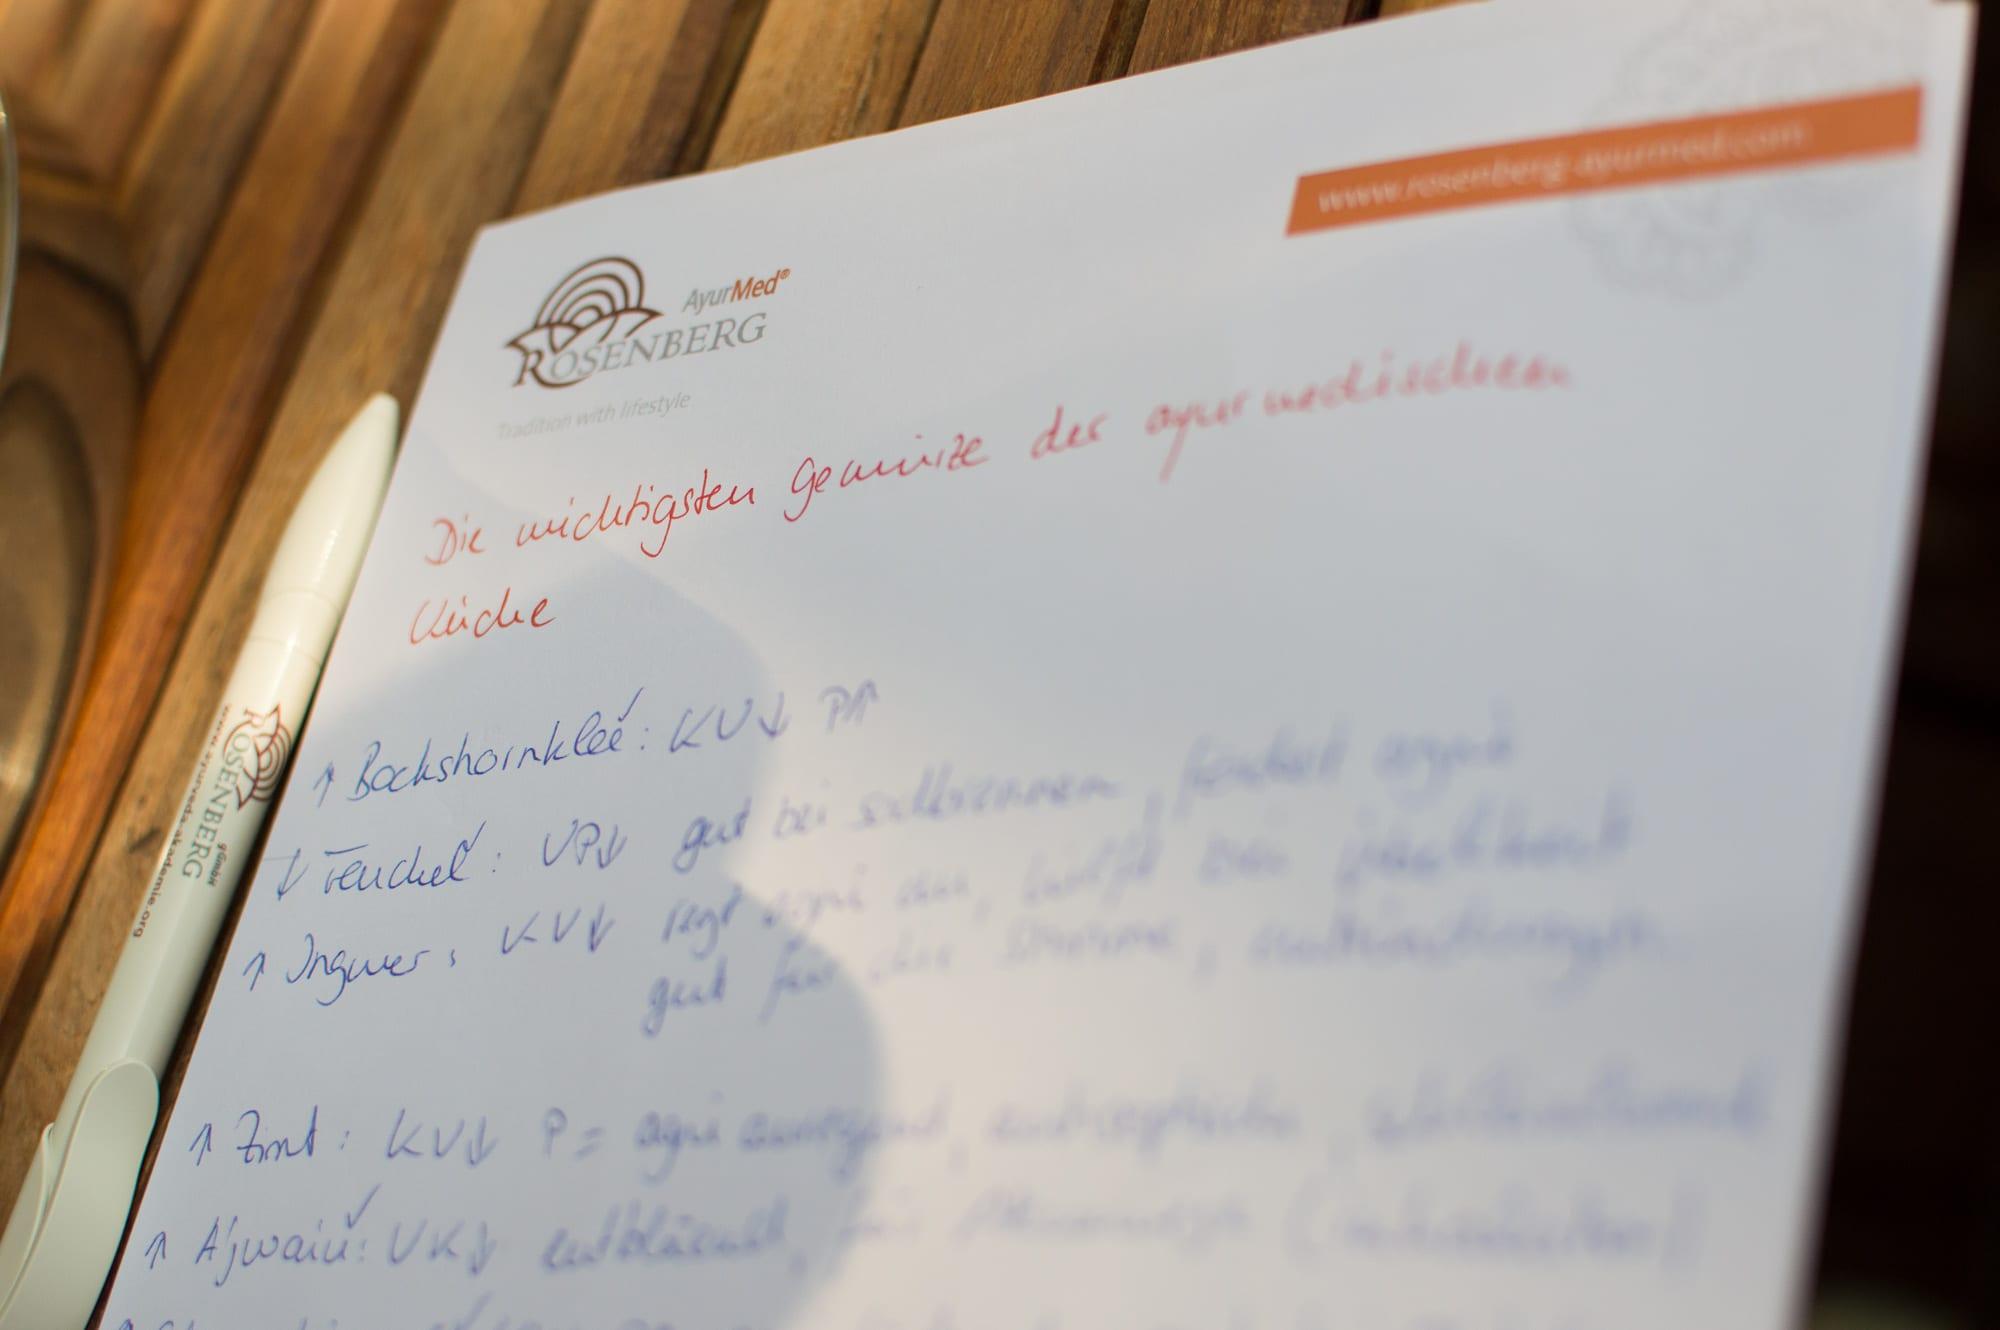 Ayurmed Rosenberg Notiz Notizblock Stift